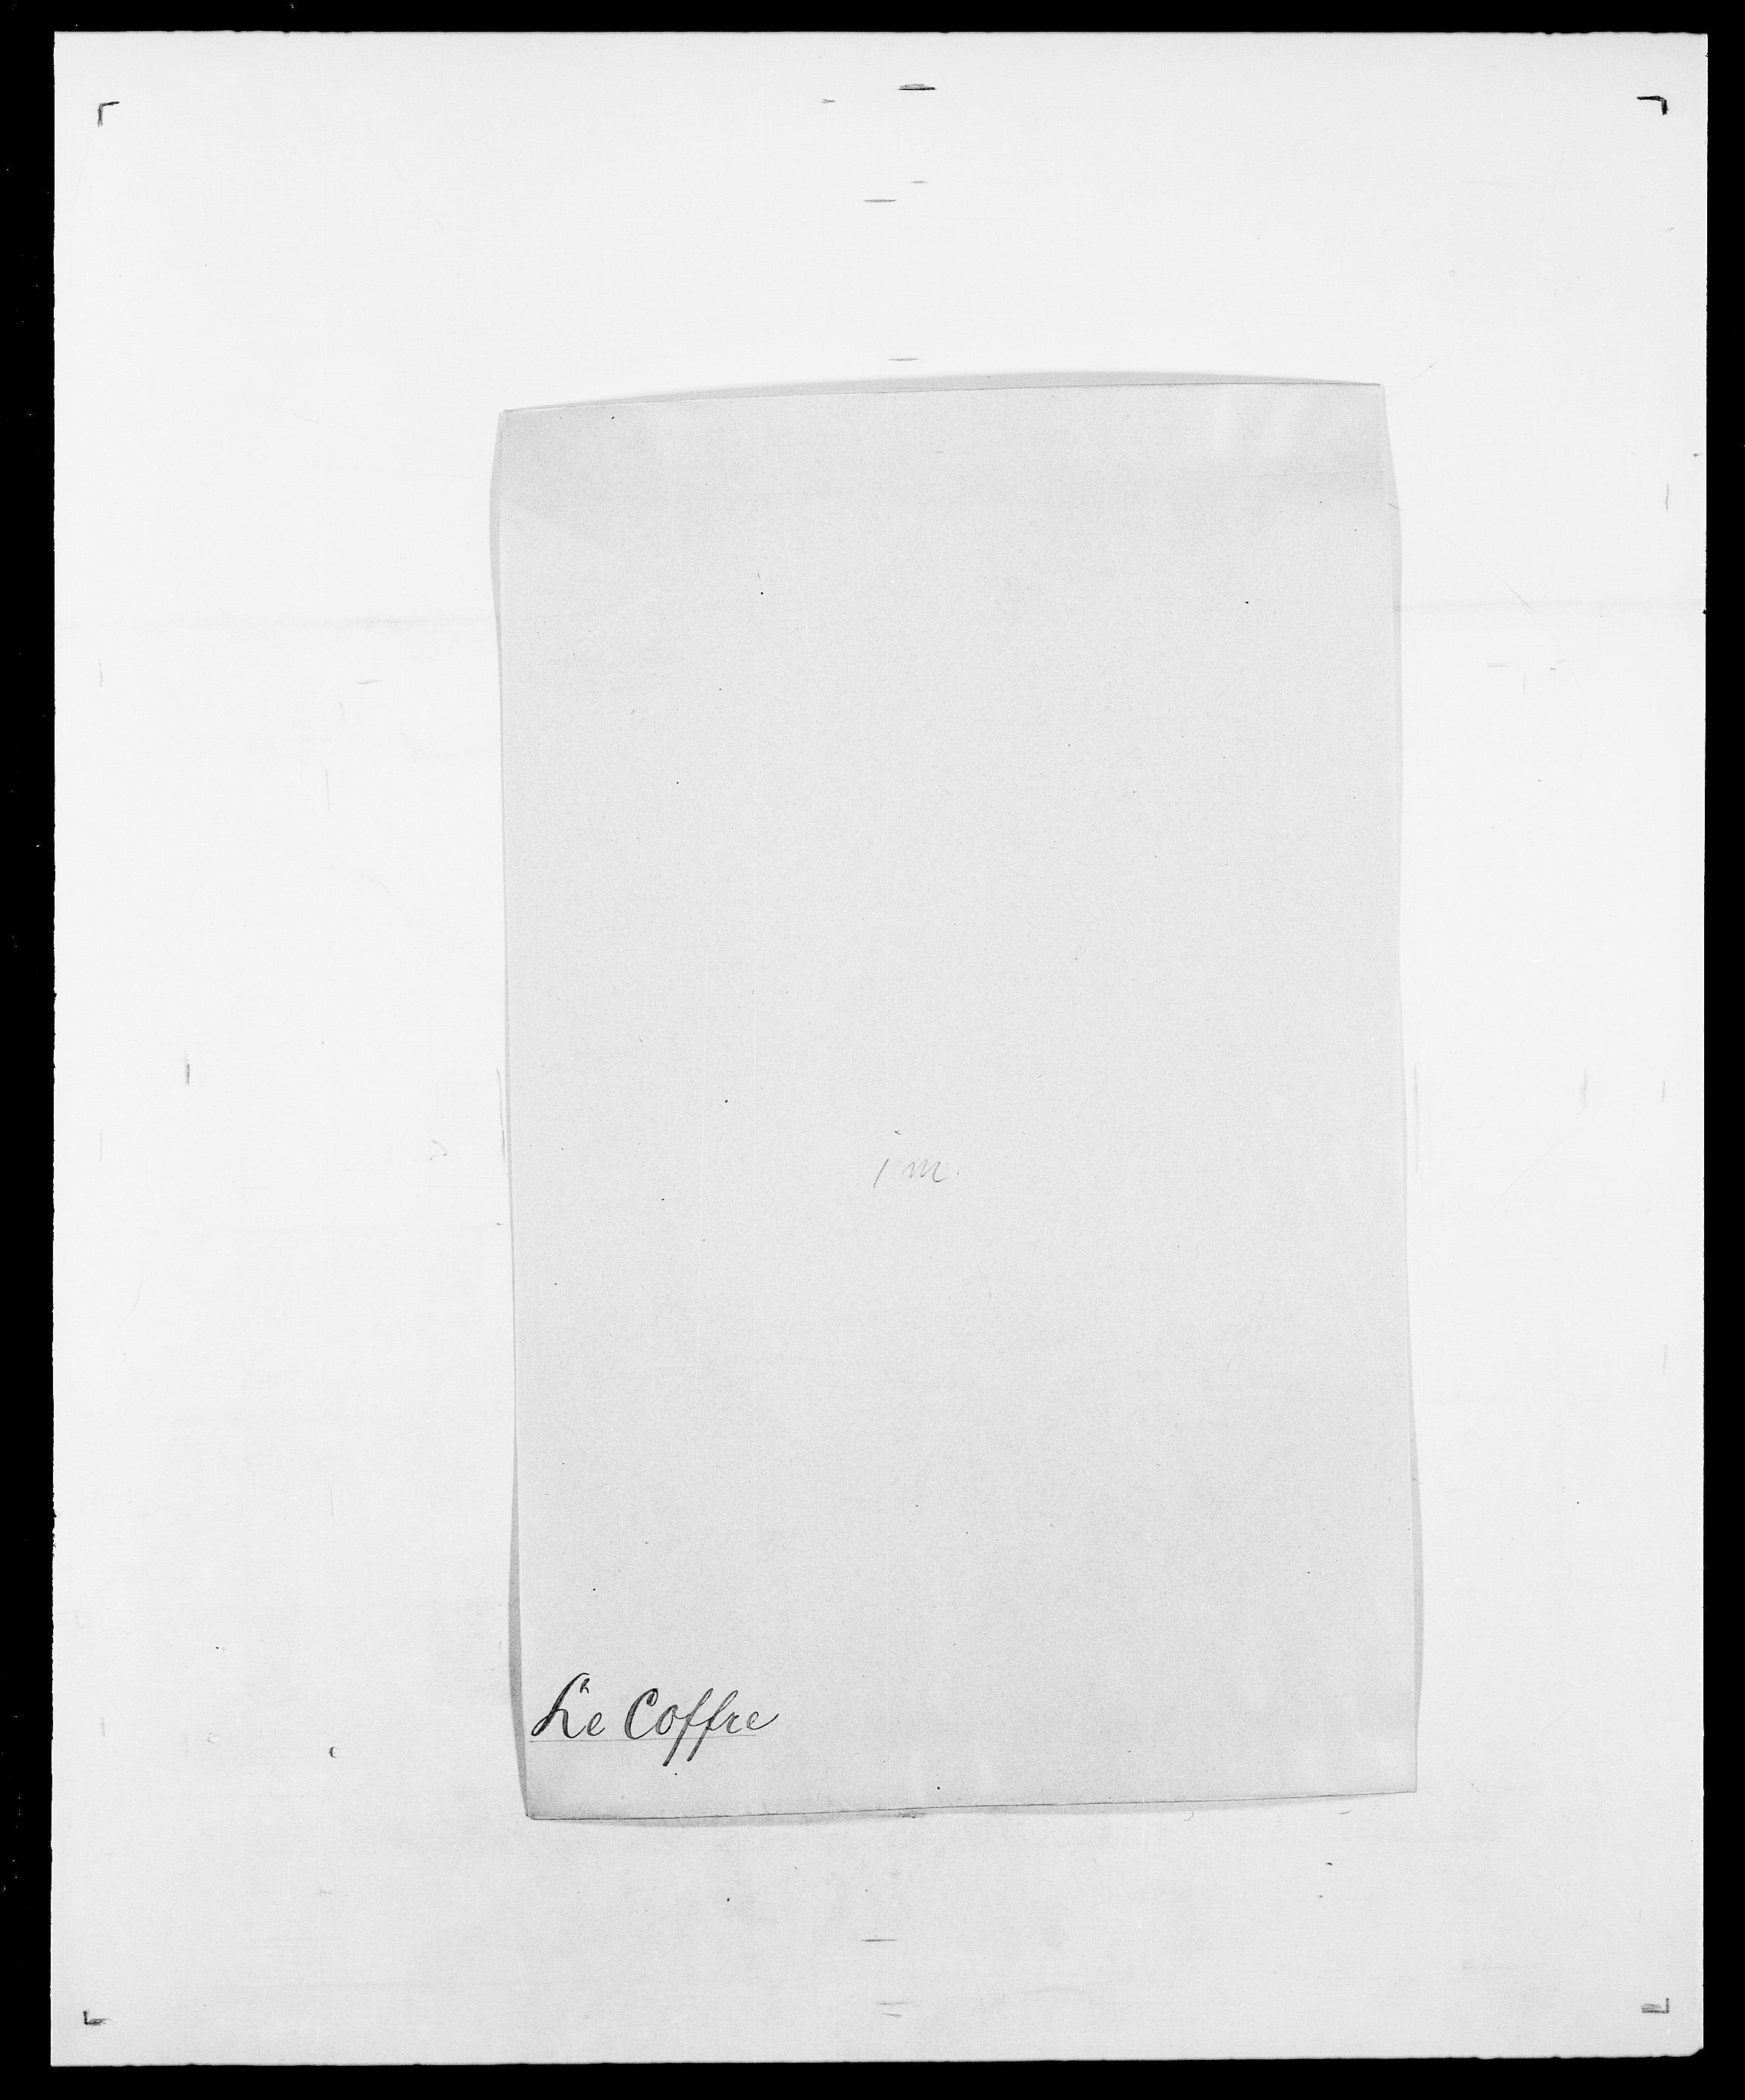 SAO, Delgobe, Charles Antoine - samling, D/Da/L0023: Lau - Lirvyn, s. 58